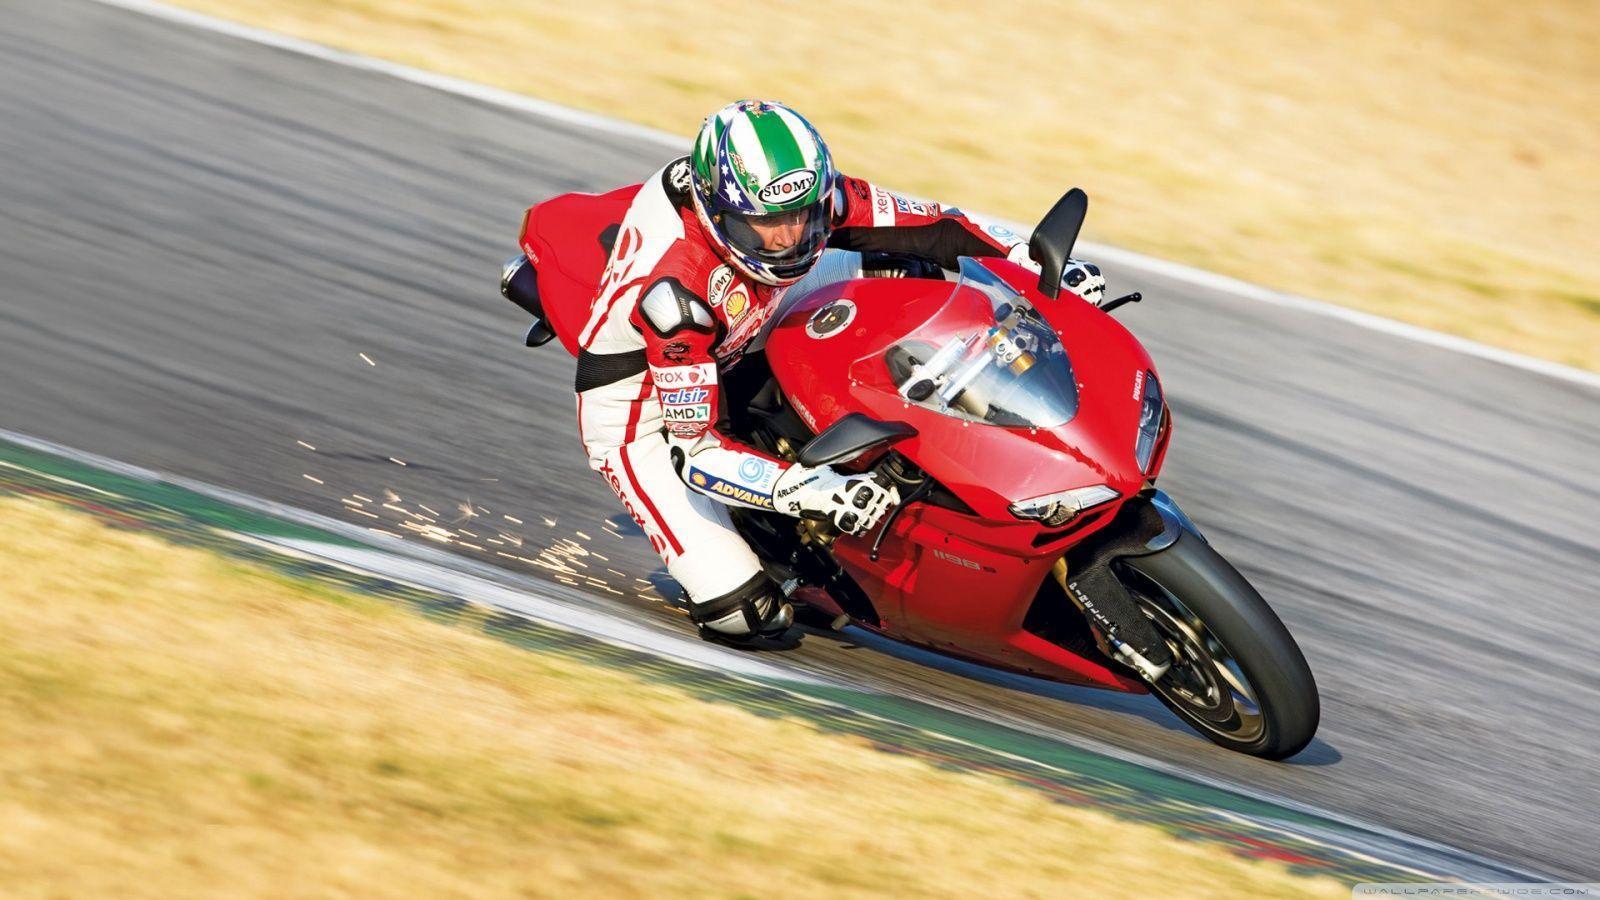 Superbike Racing Wallpapers - - 169.2KB